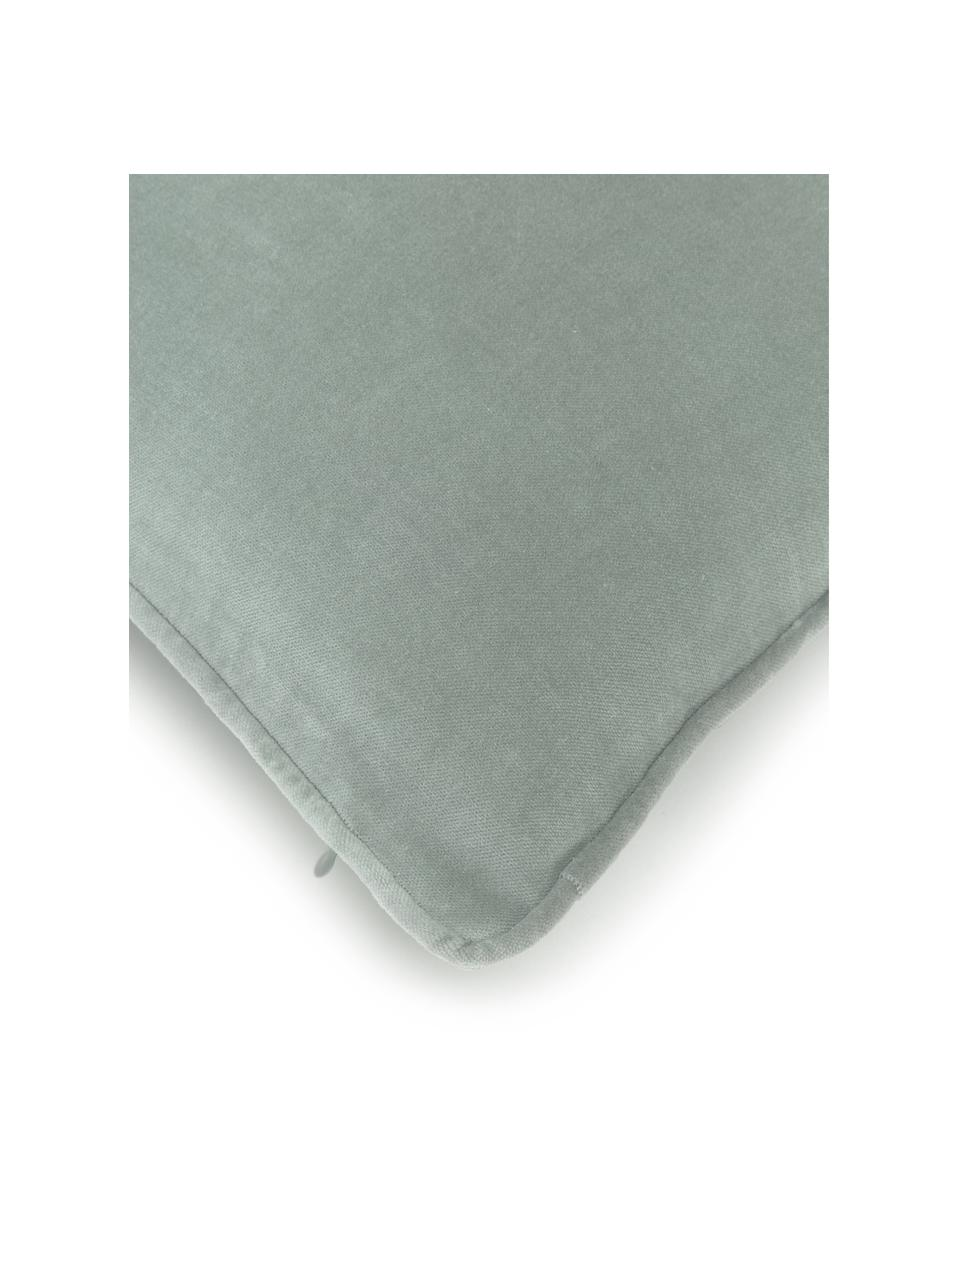 Federa arredo in velluto verde salvia Dana, 100% velluto di cotone, Verde salvia, Larg. 50 x Lung. 50 cm